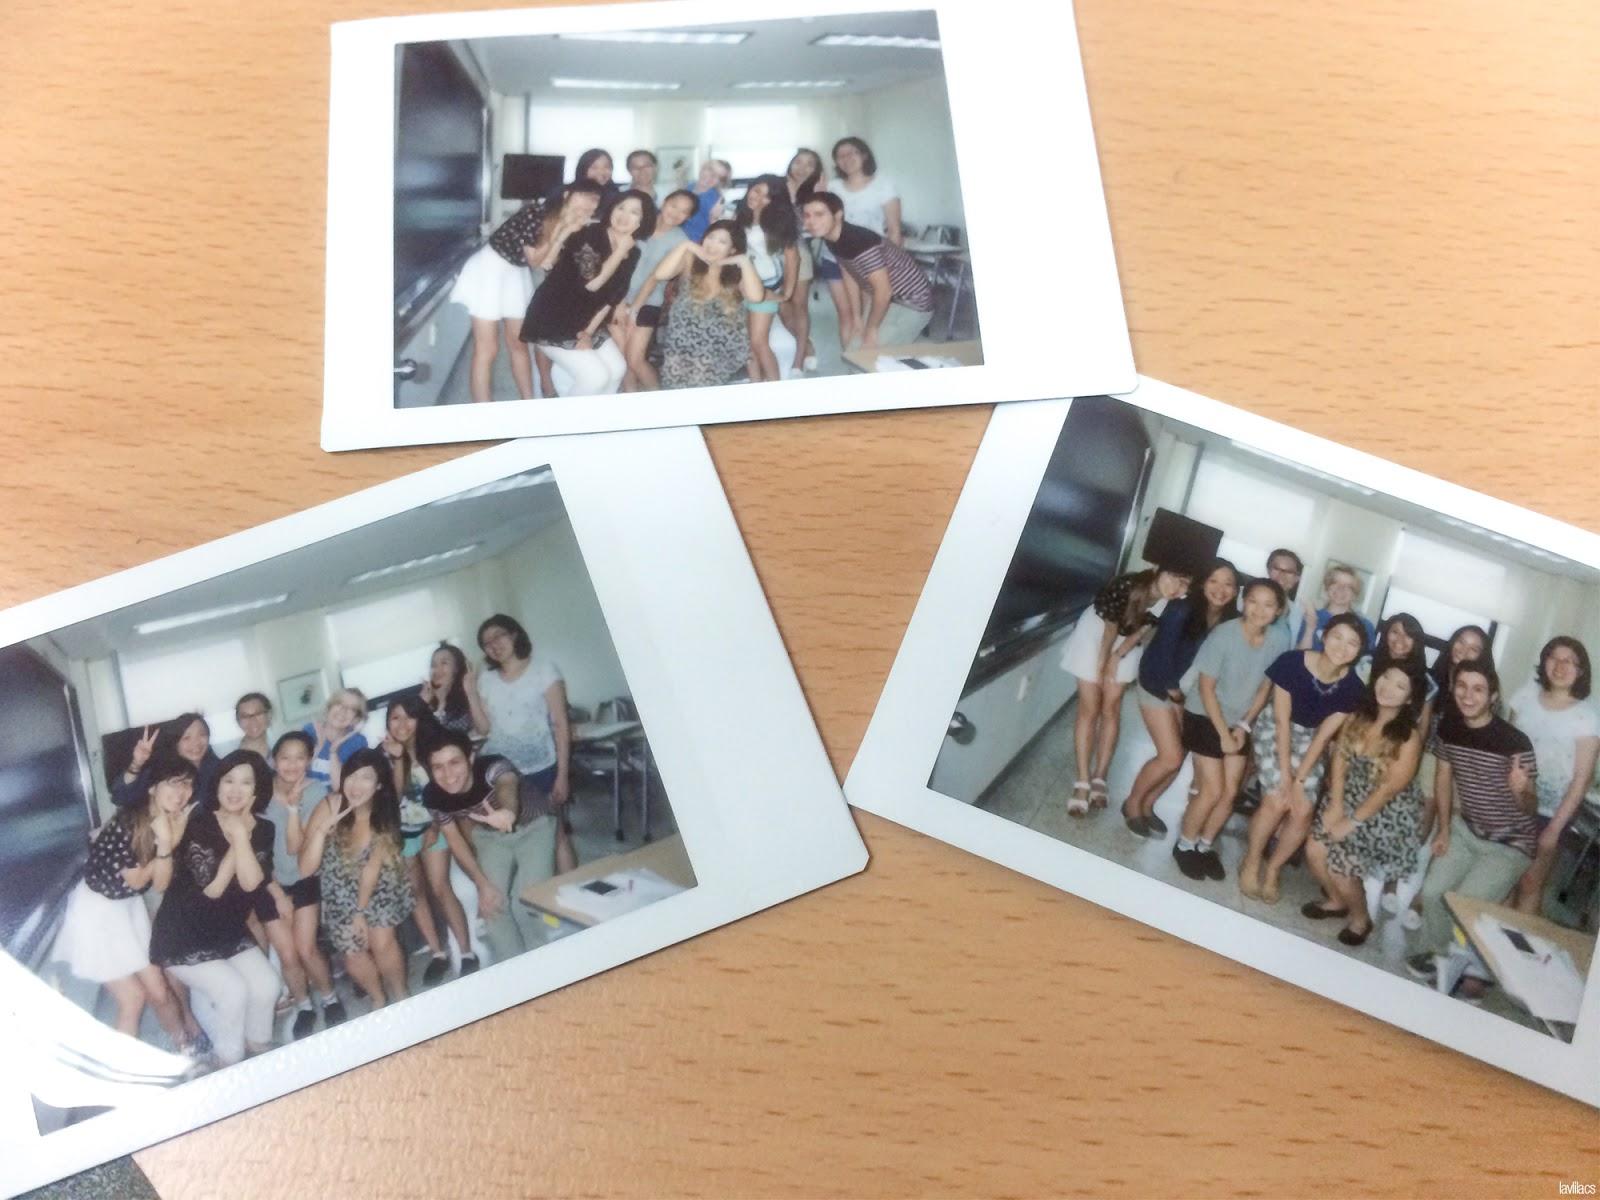 Seoul, Korea - Summer Study Abroad 2014 - Last day of KLI group photo polaroids